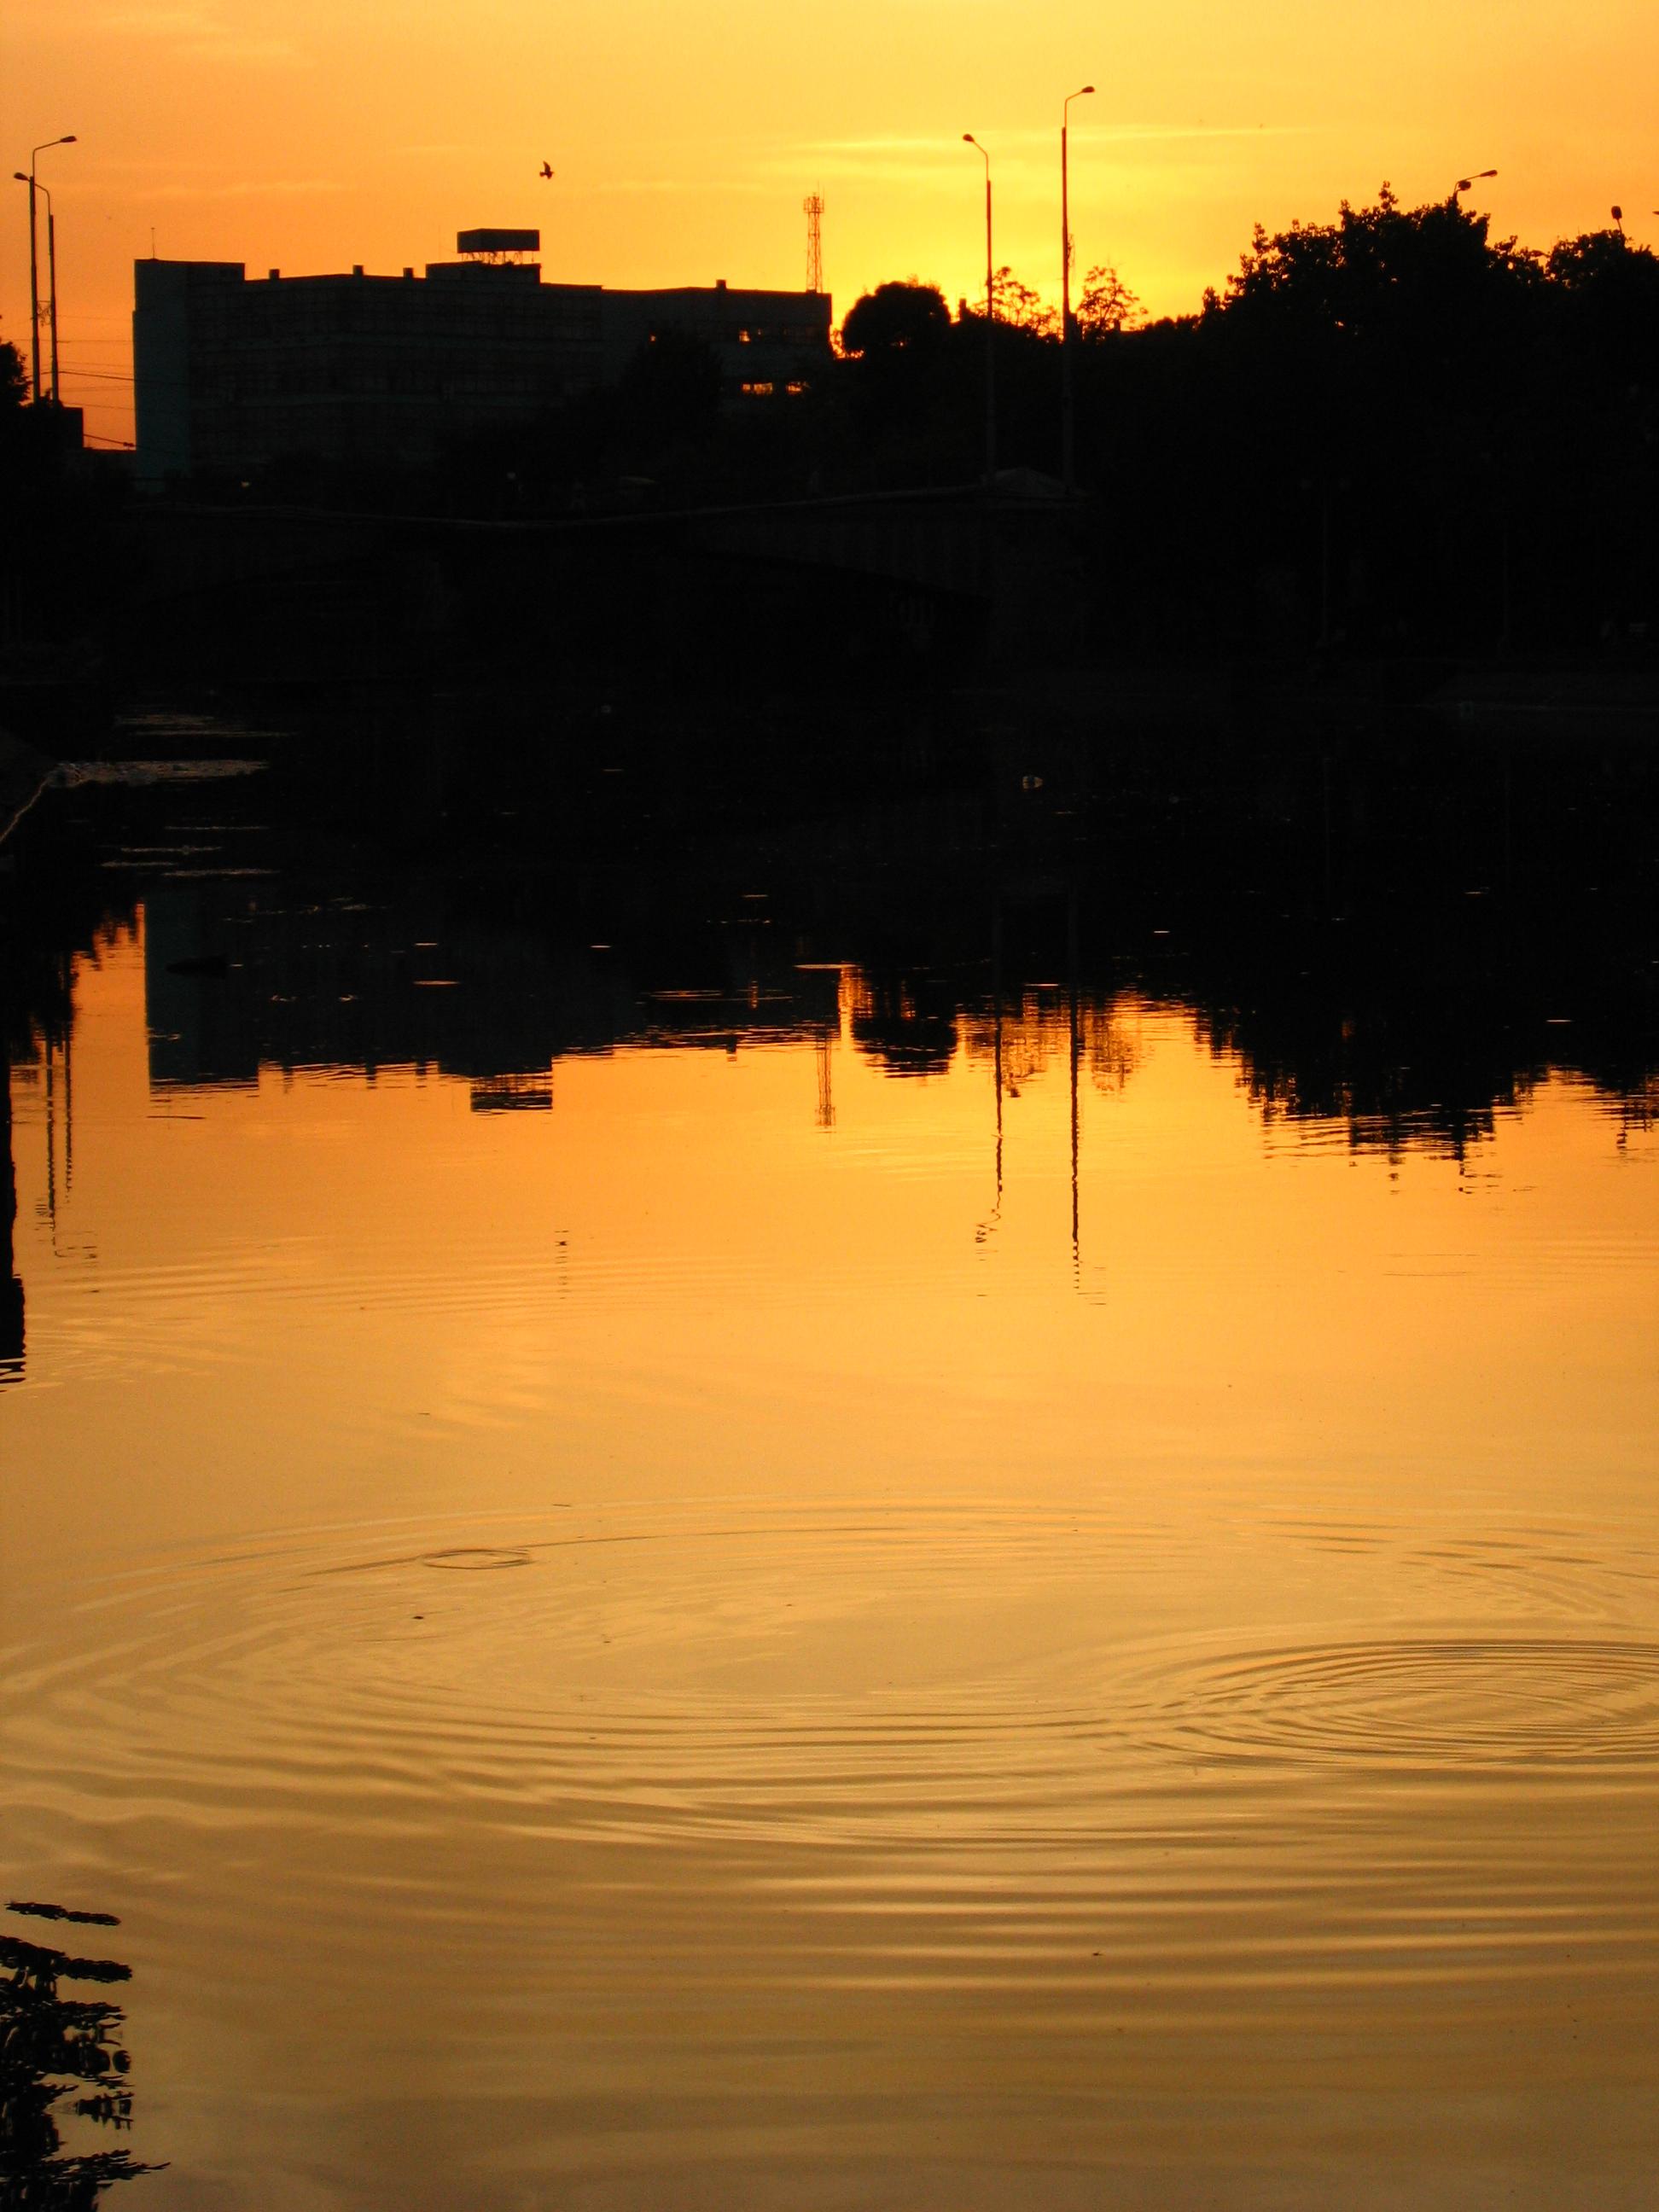 City river photo